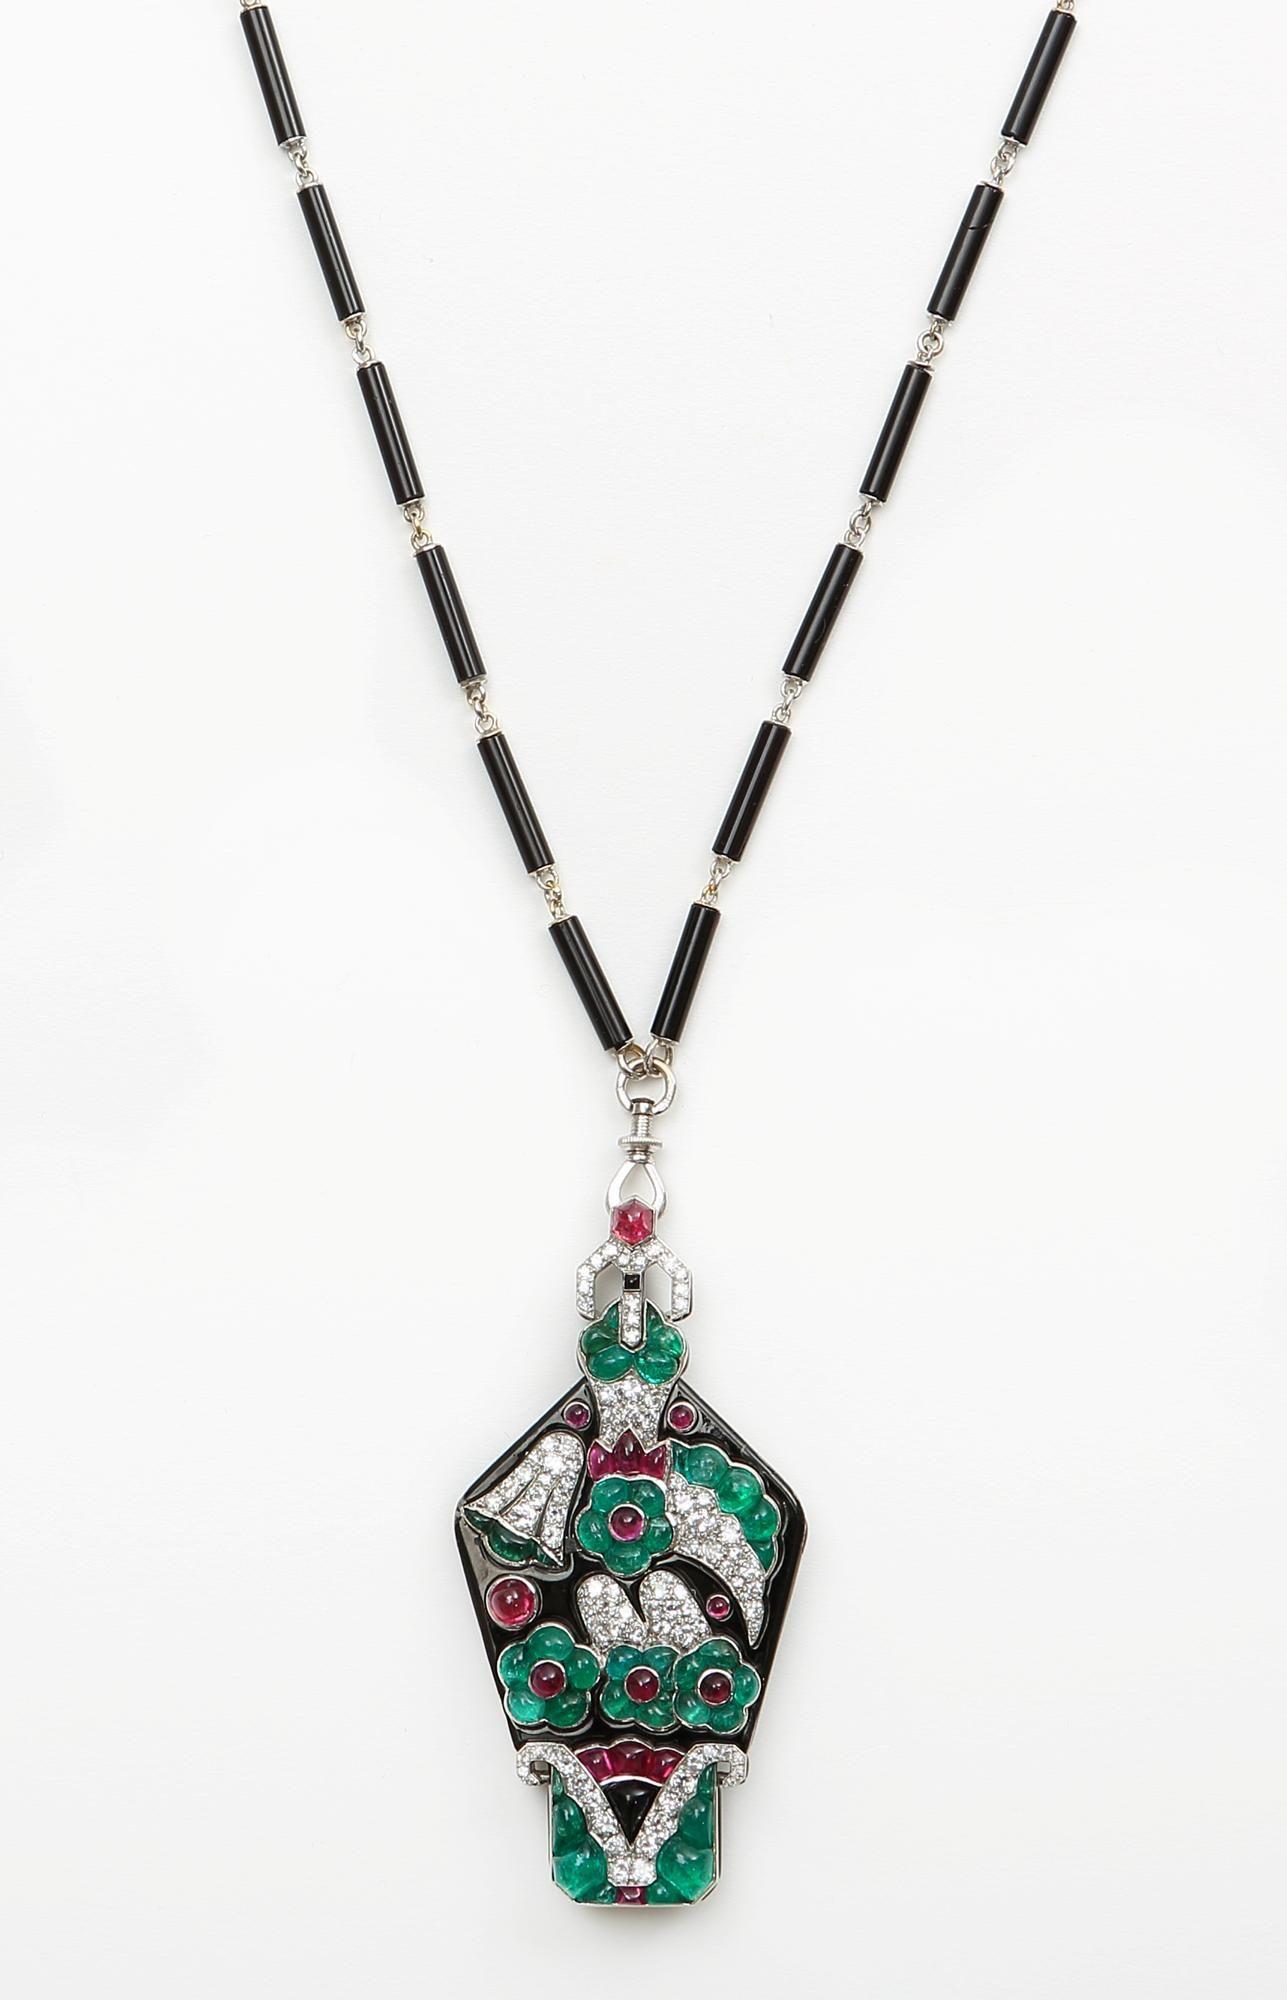 Art deco necklacelorgnette by mauboussin in enameled platinum set